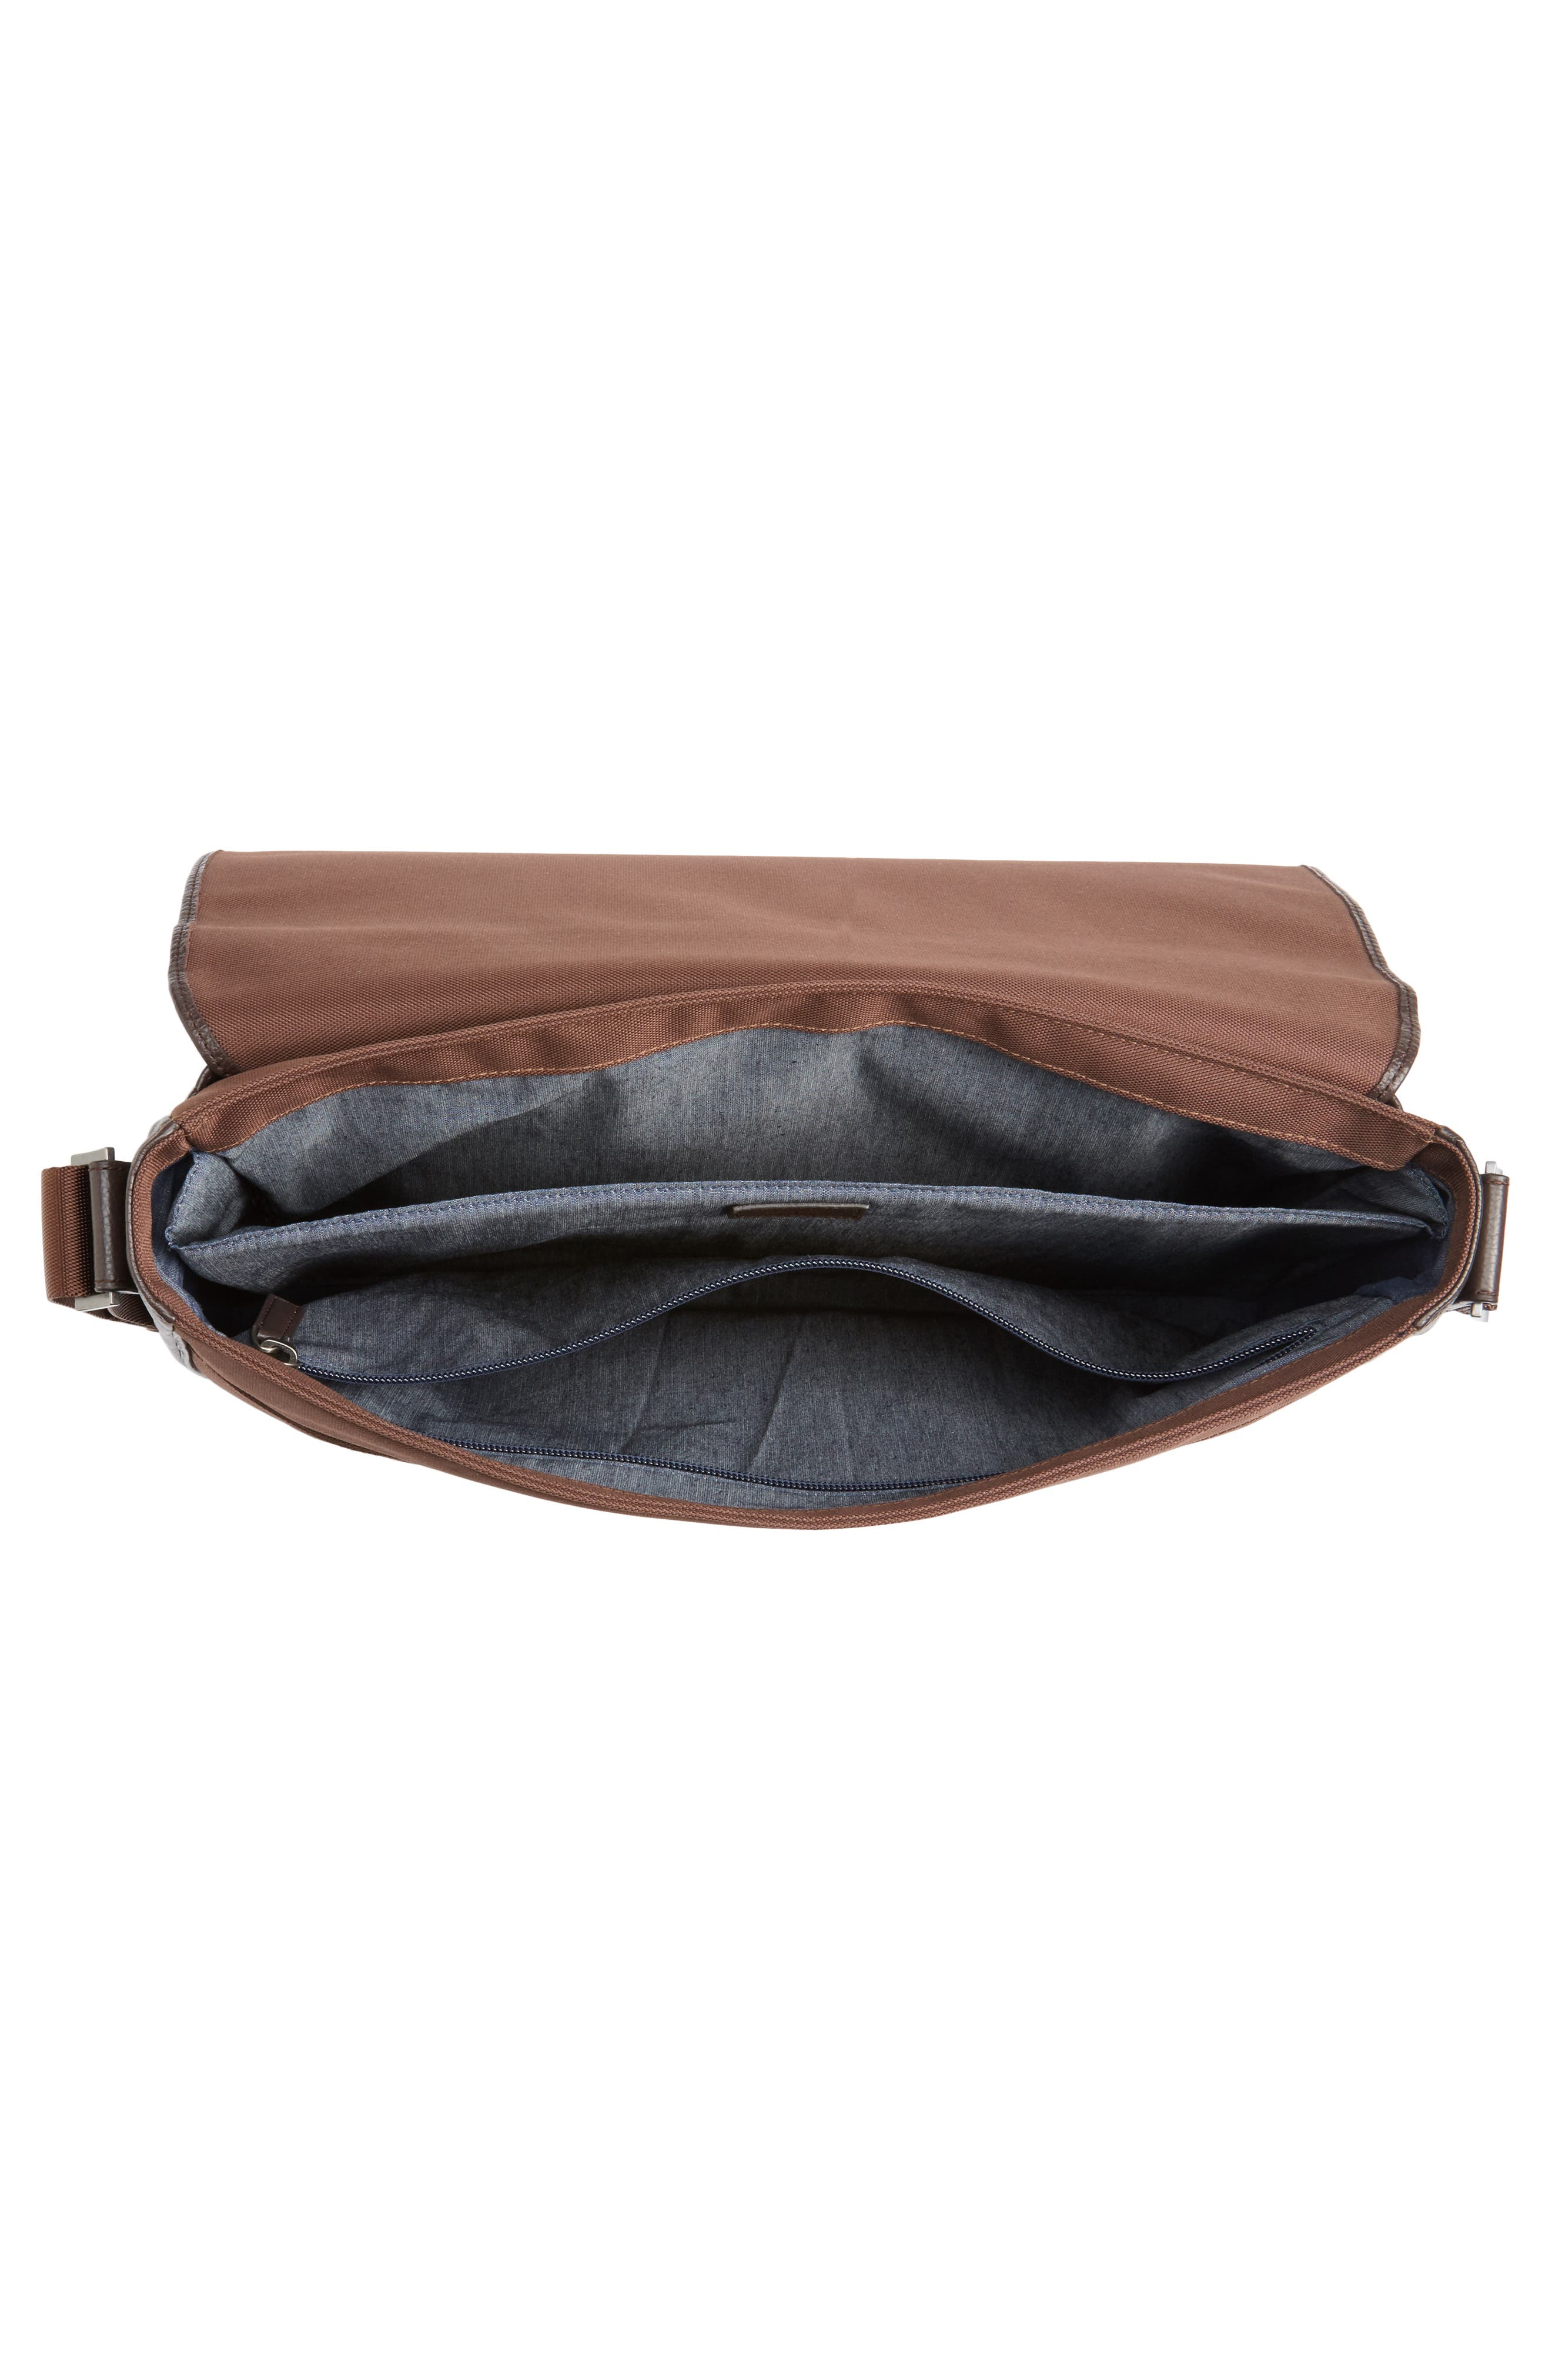 Midland Leather Messenger Bag,                             Alternate thumbnail 4, color,                             Brown